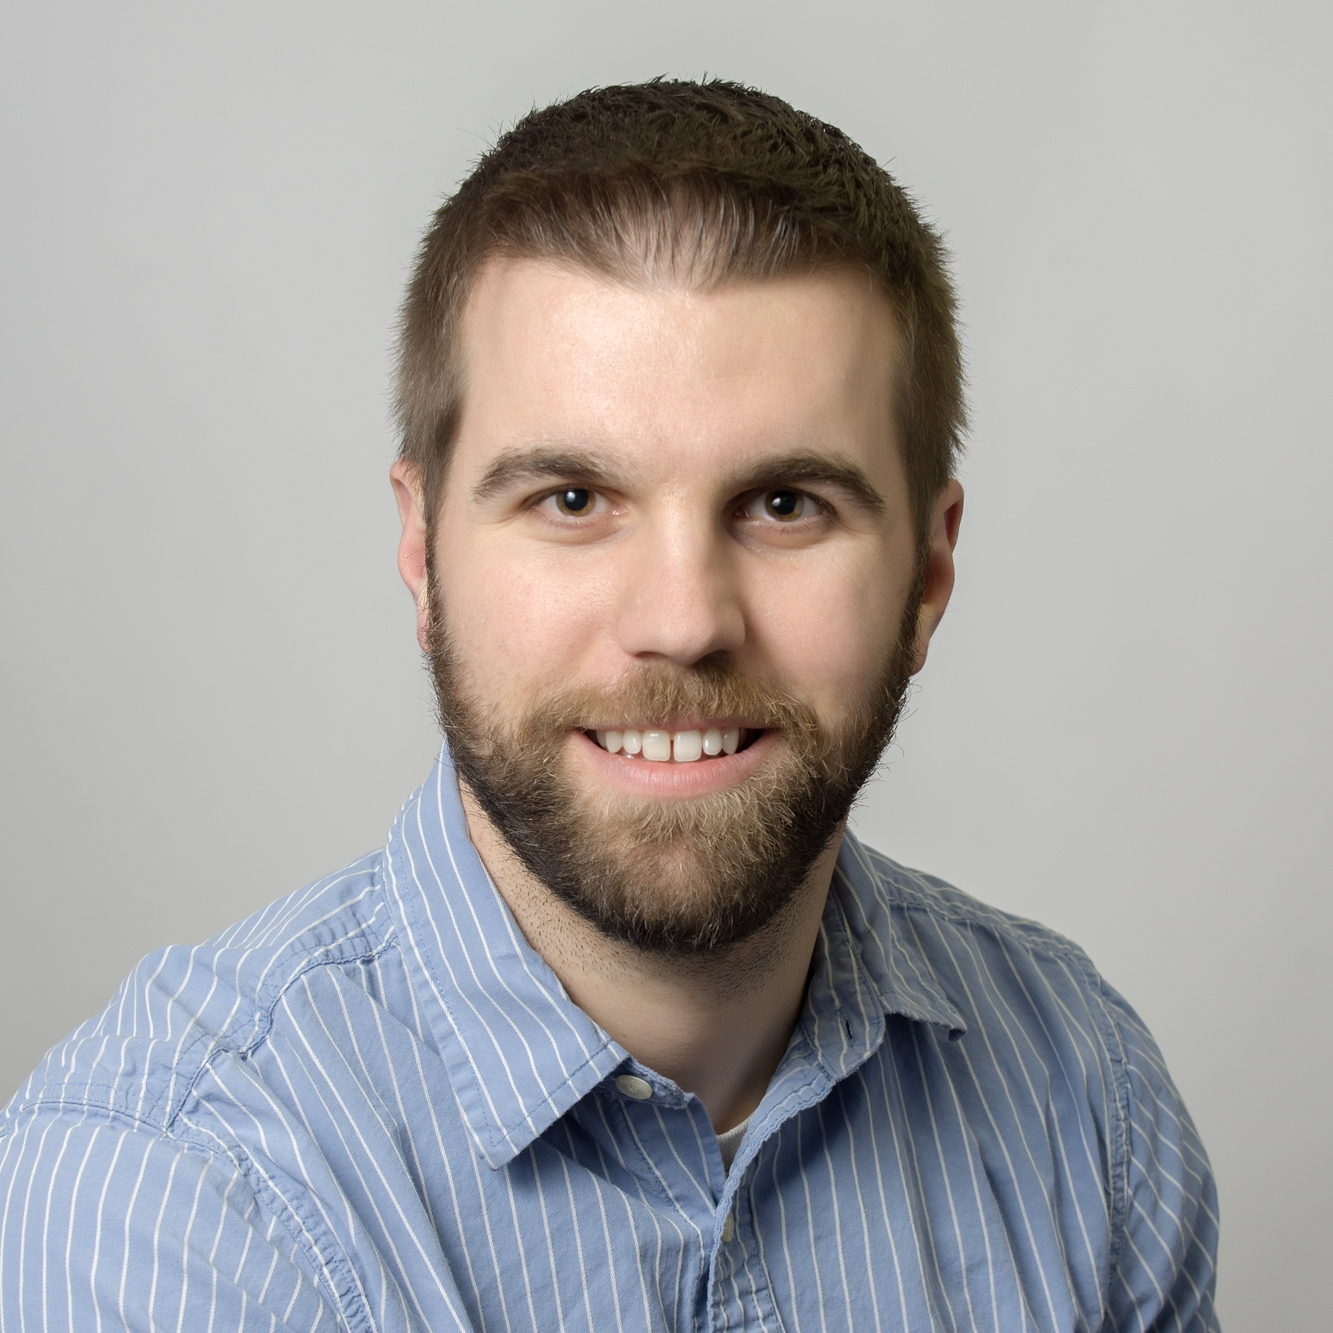 Jonathan Yeakel, BBA, CBIS Case Manager